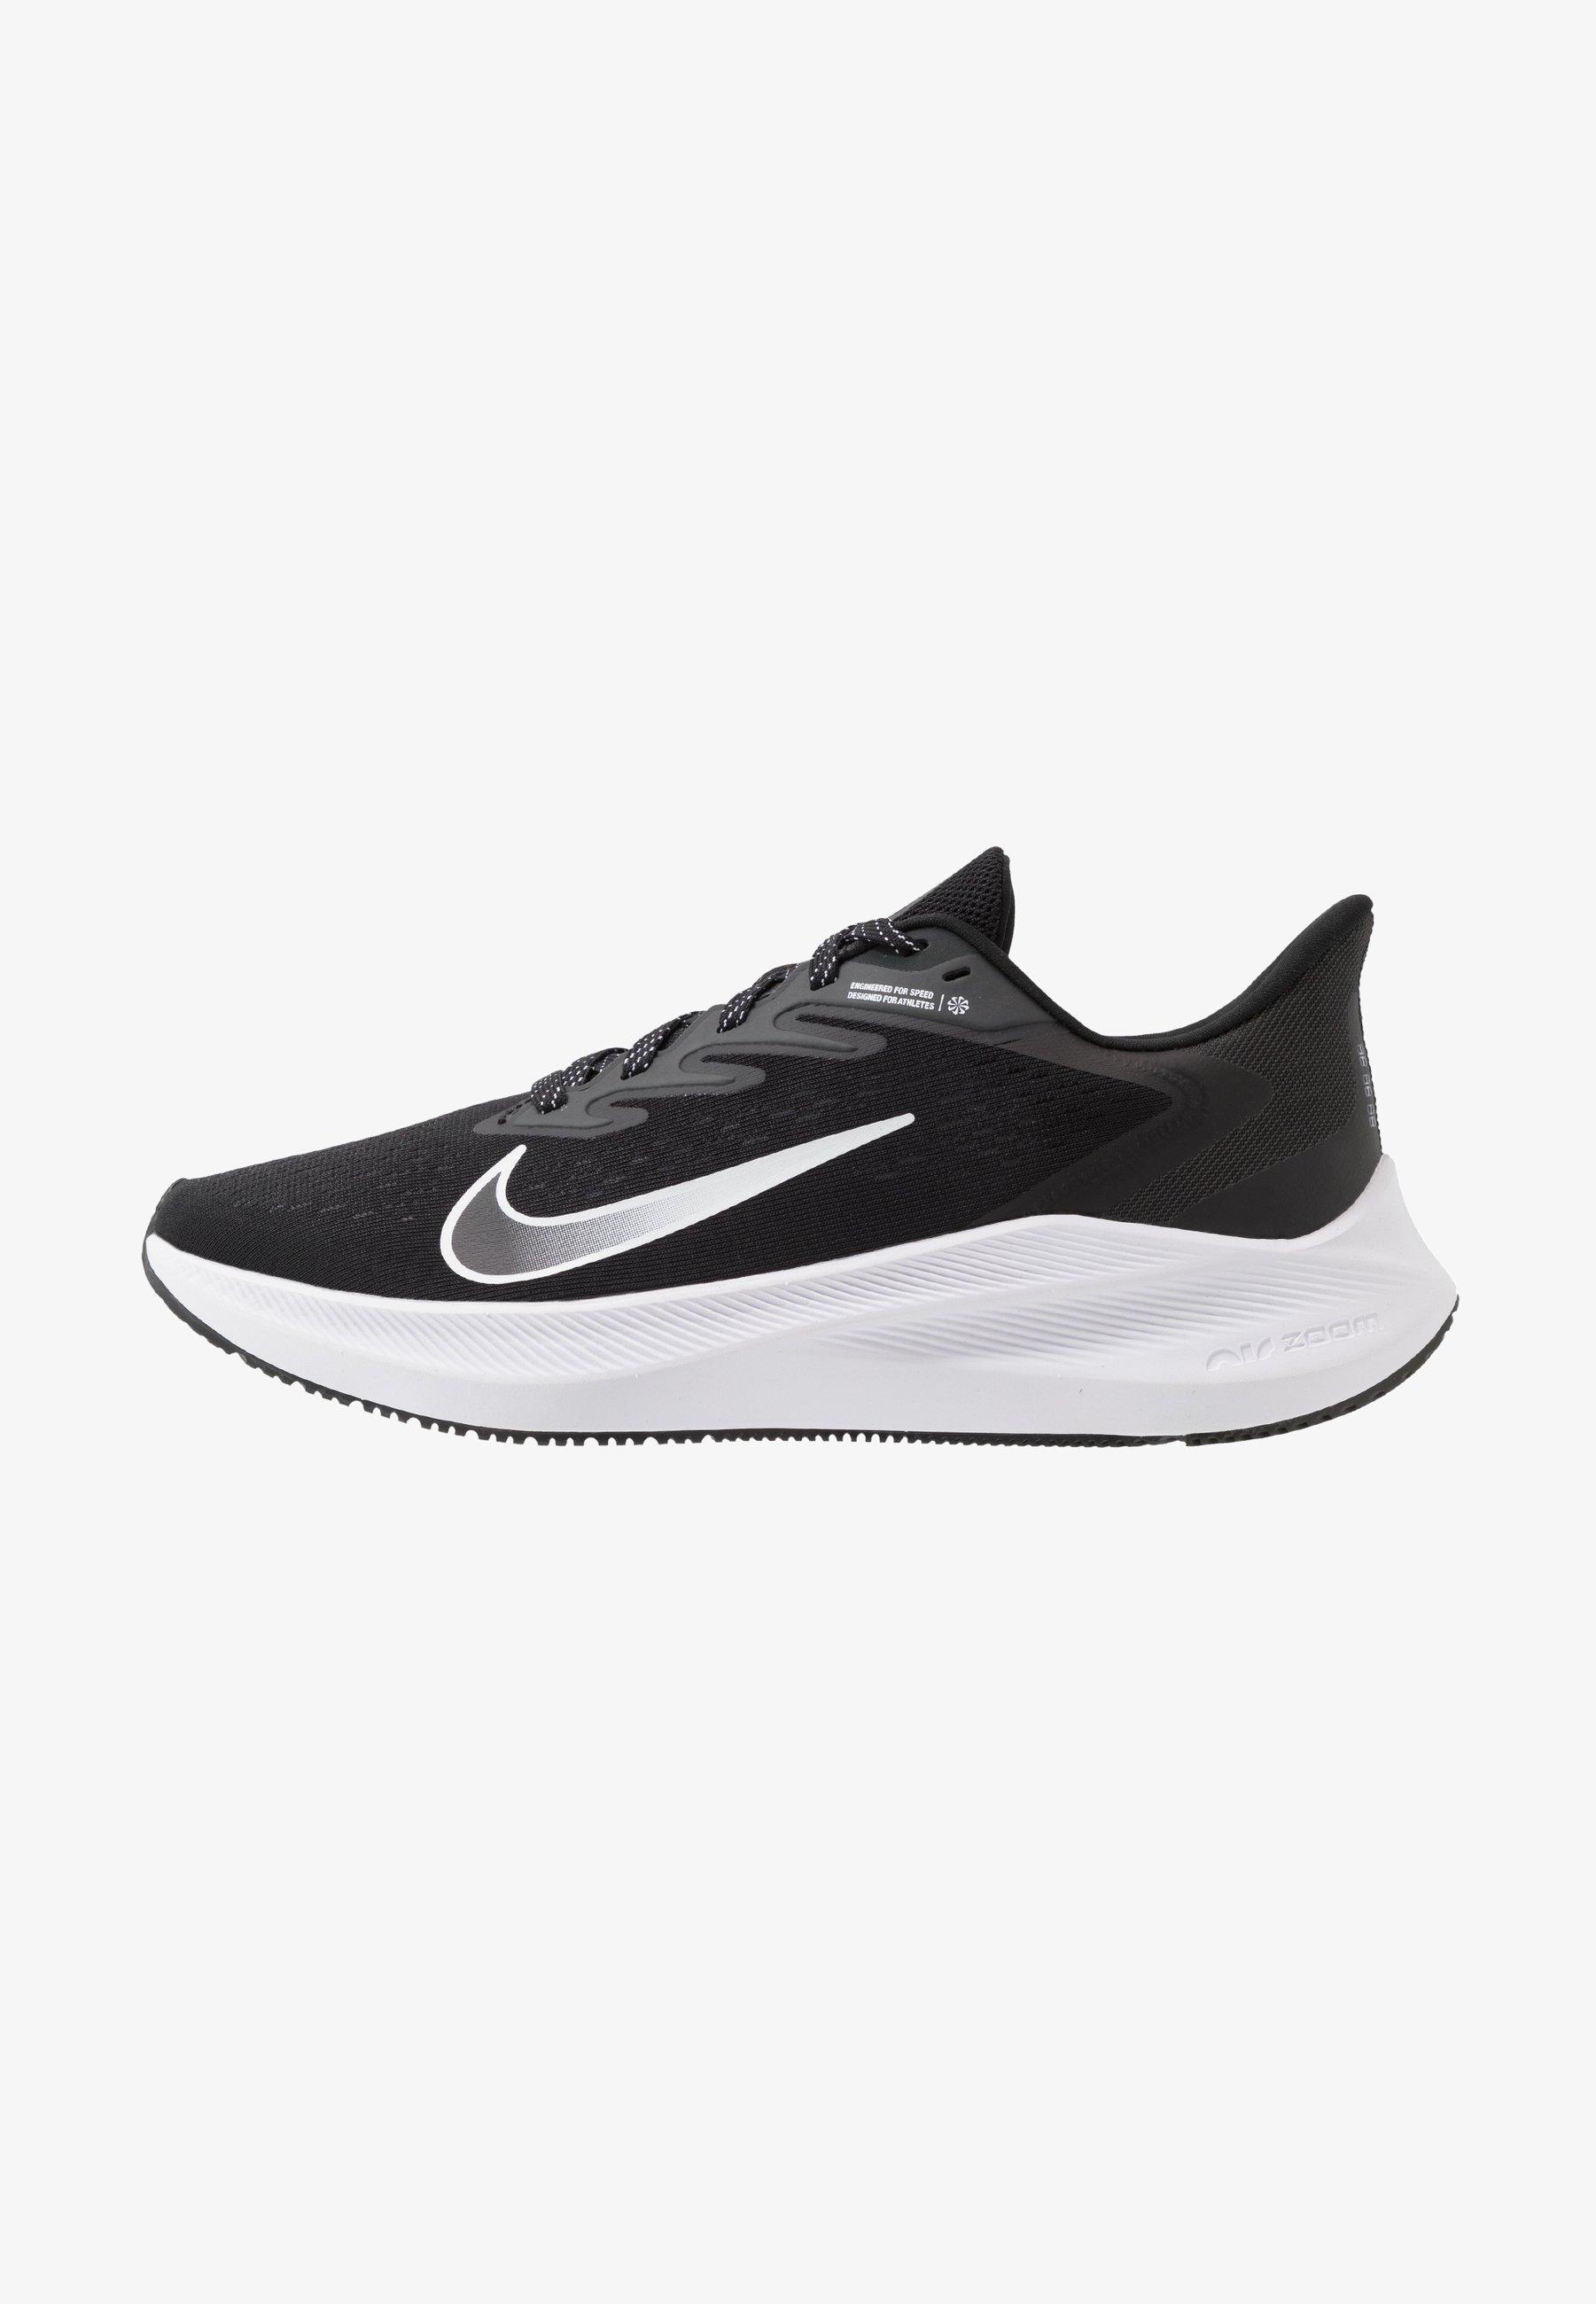 retirarse represa atómico  Nike Performance ZOOM WINFLO - Zapatillas de running neutras -  black/white/anthracite/negro - Zalando.es